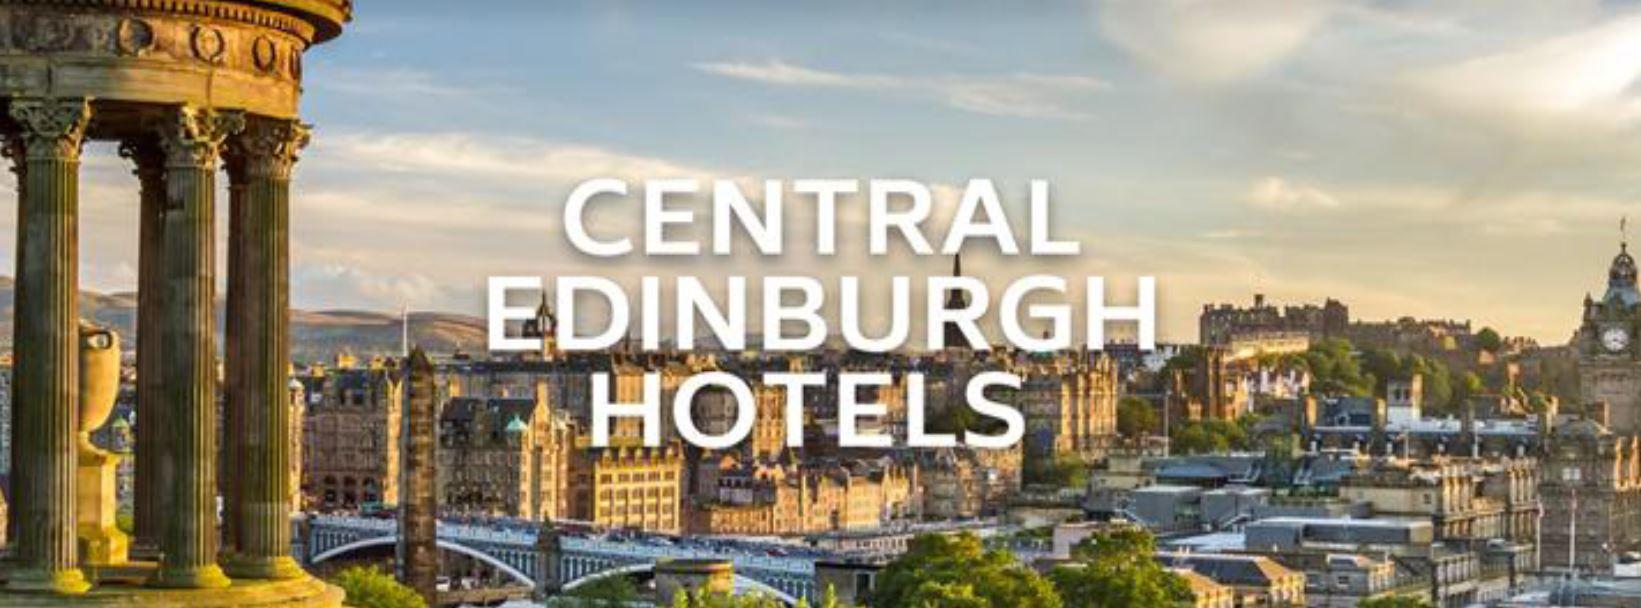 Central Edinburgh Hotels